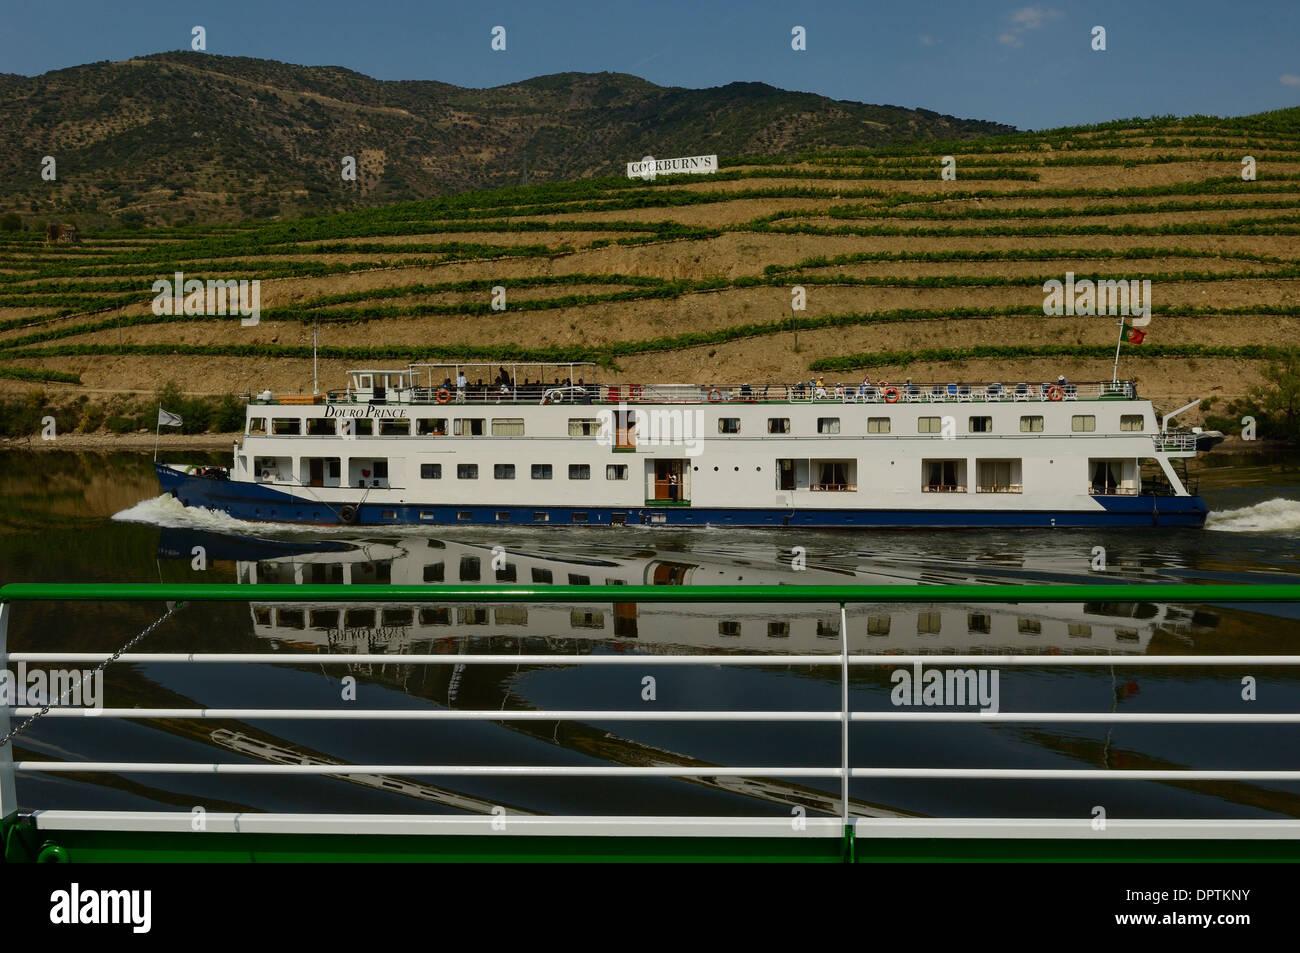 Douro River Cruise Ship Portugal Europe Stock Photo Royalty - River cruise ships europe